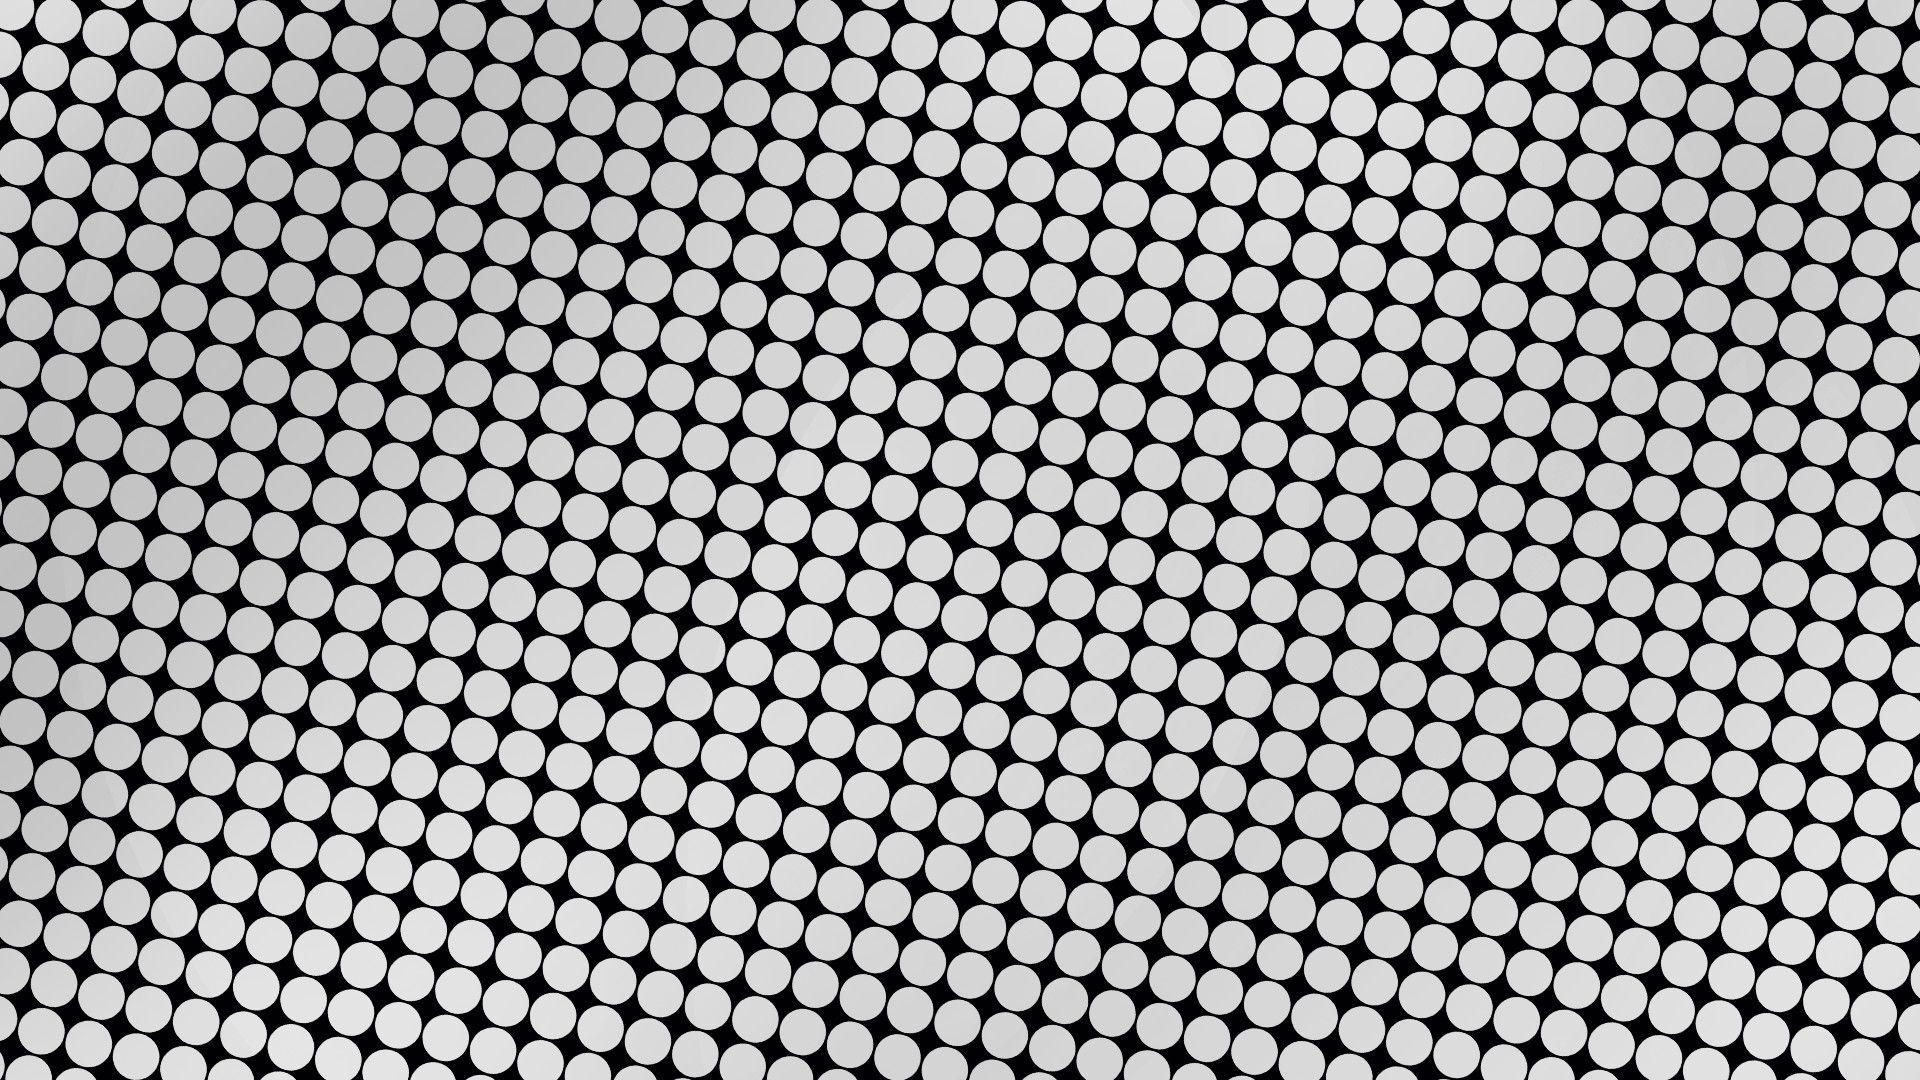 Dots full hd 1080p wallpaper